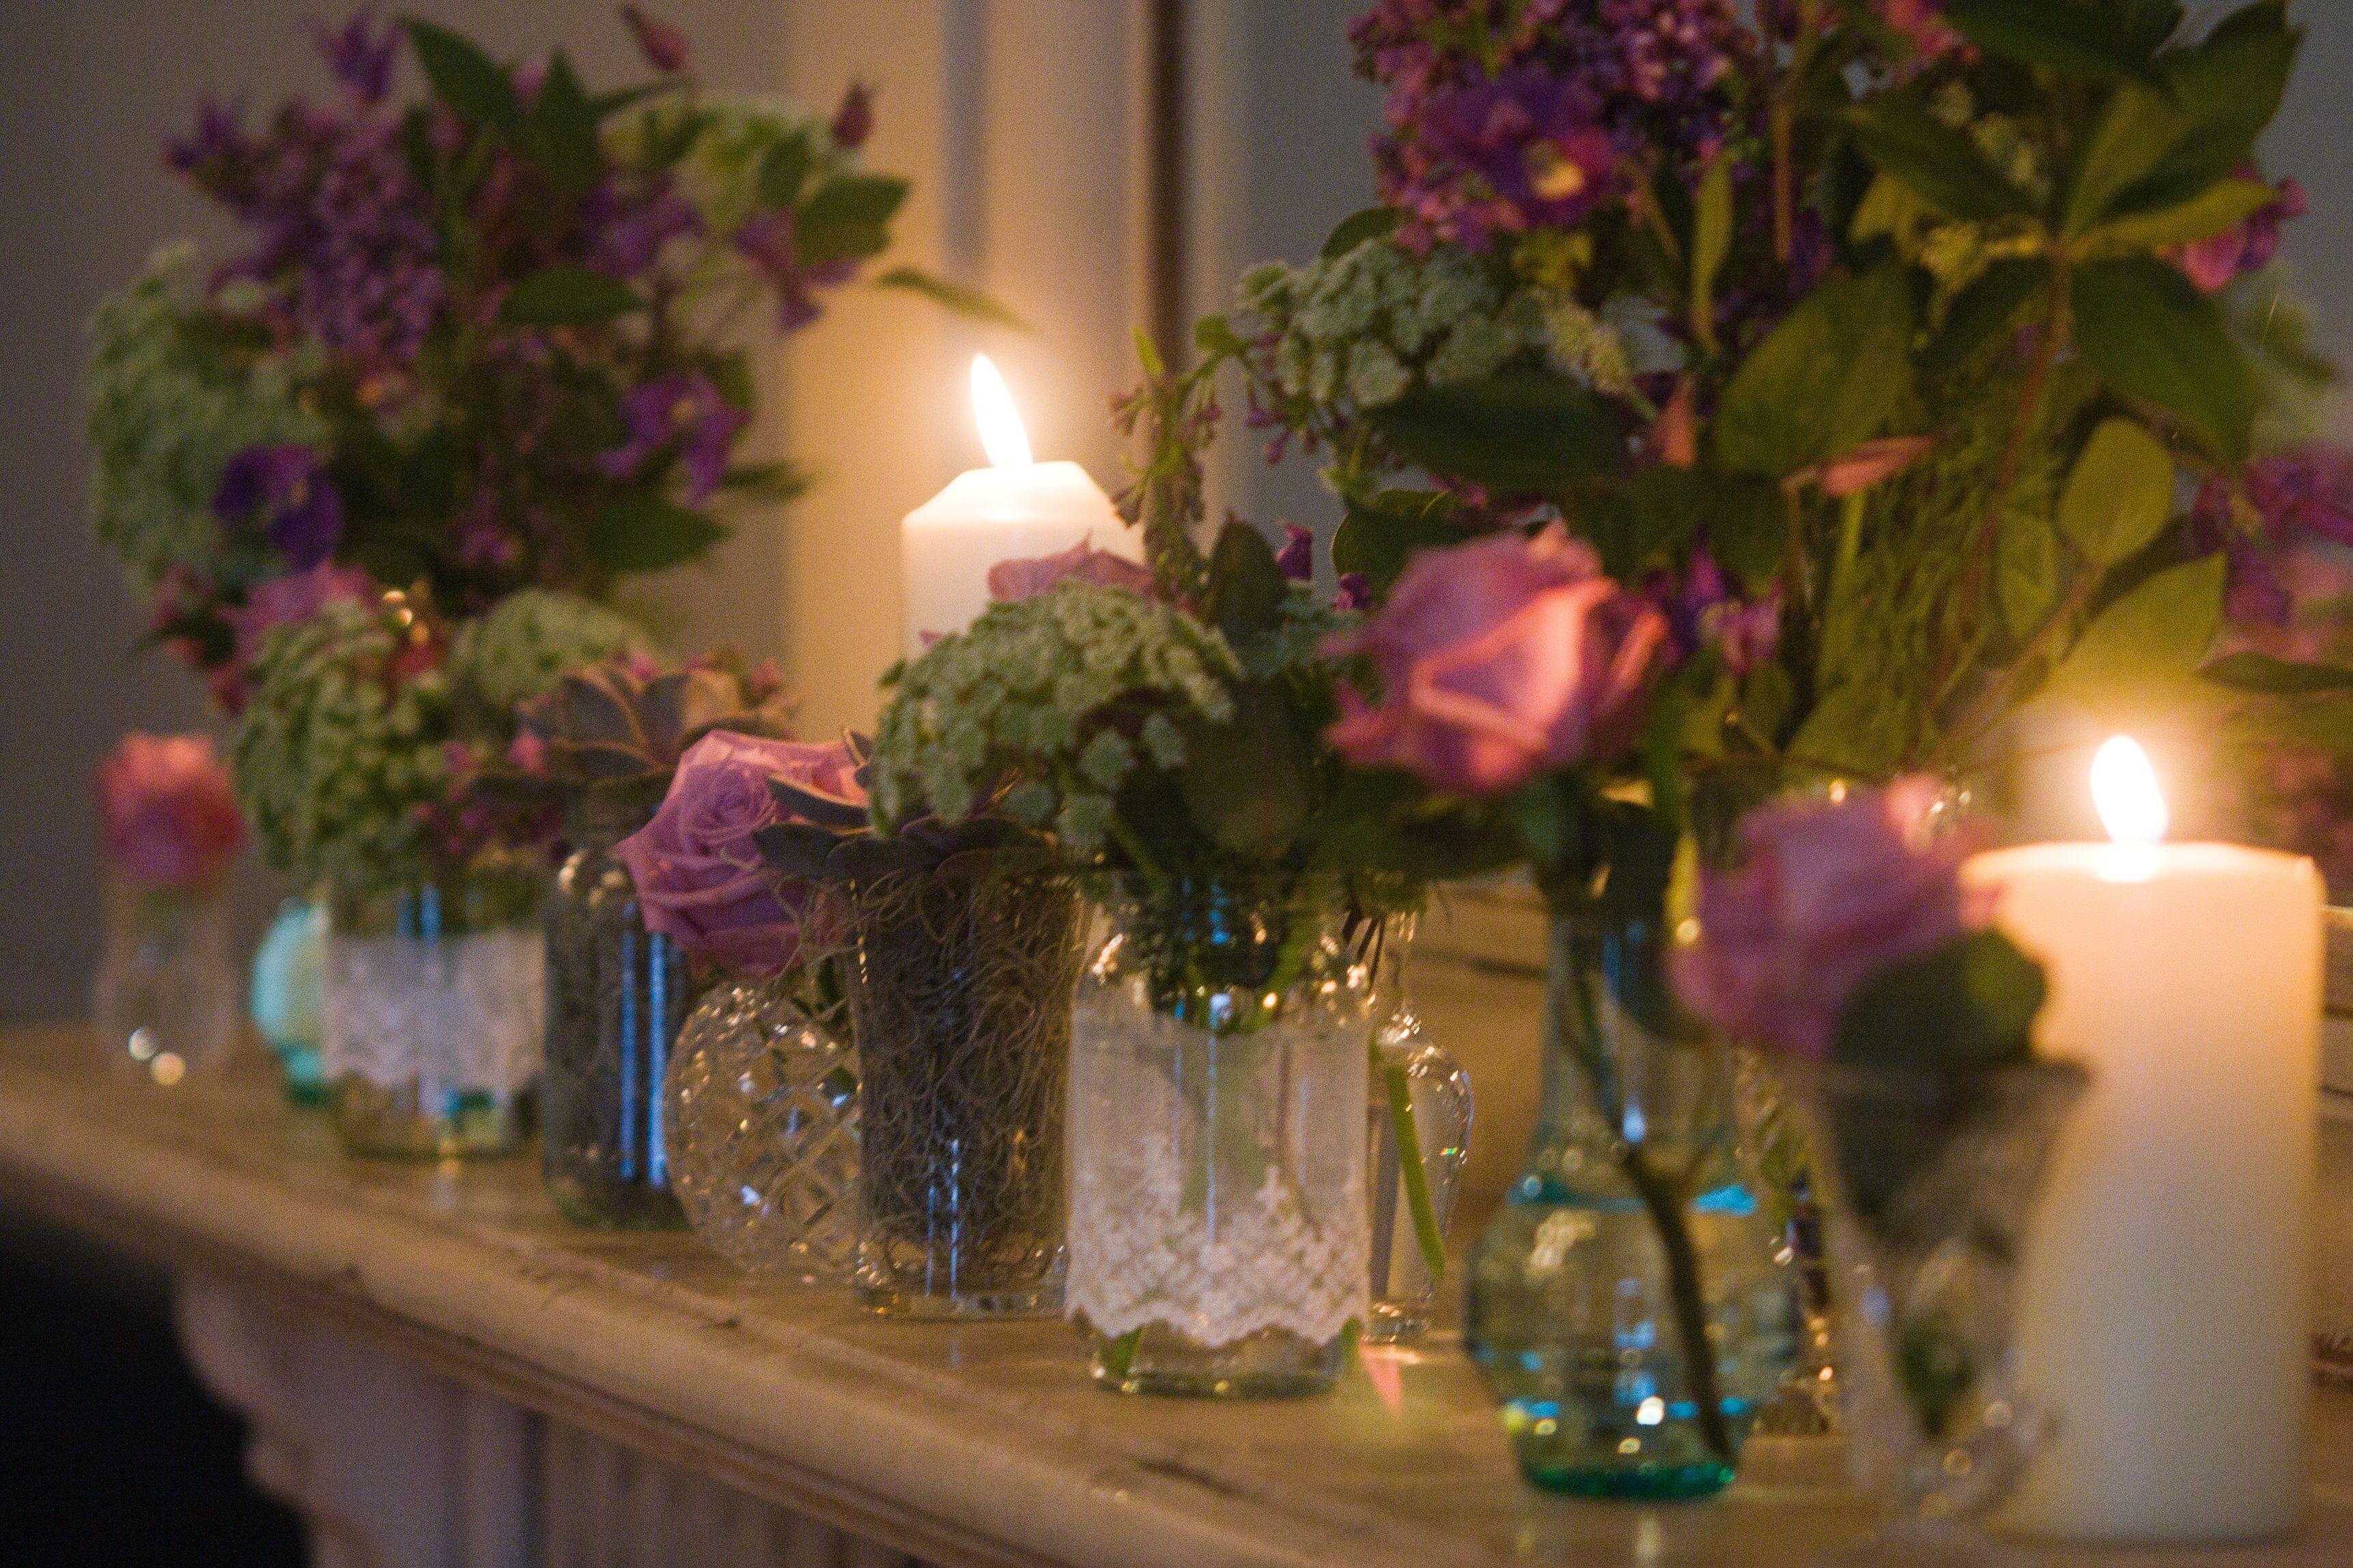 Wedding decor images  Fireplace wedding decor  wedding ideas  Pinterest  Weddings and